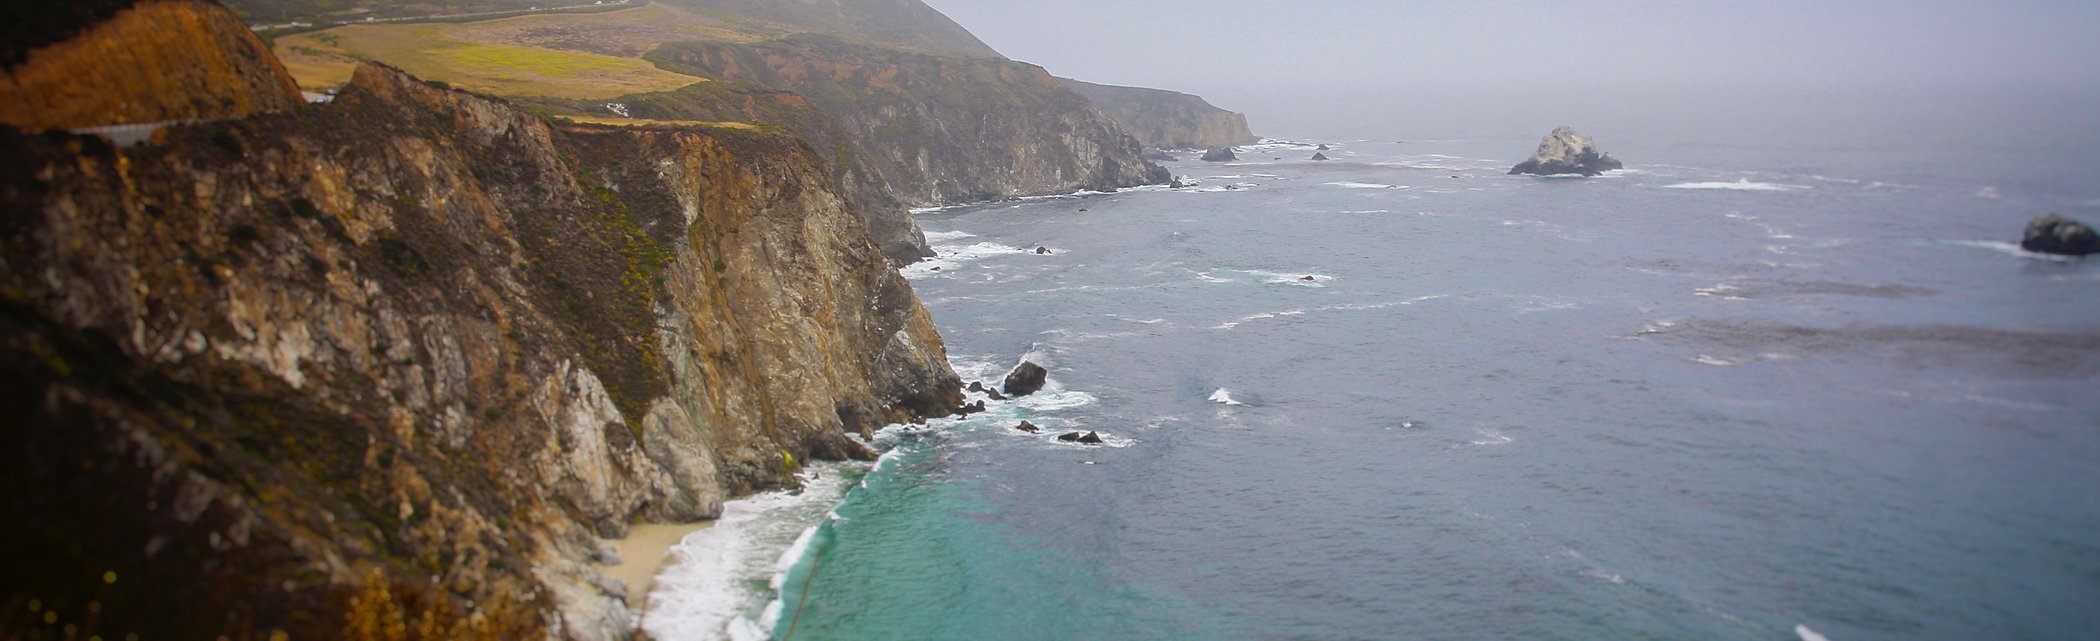 cliff-coast-fog-1643580.png